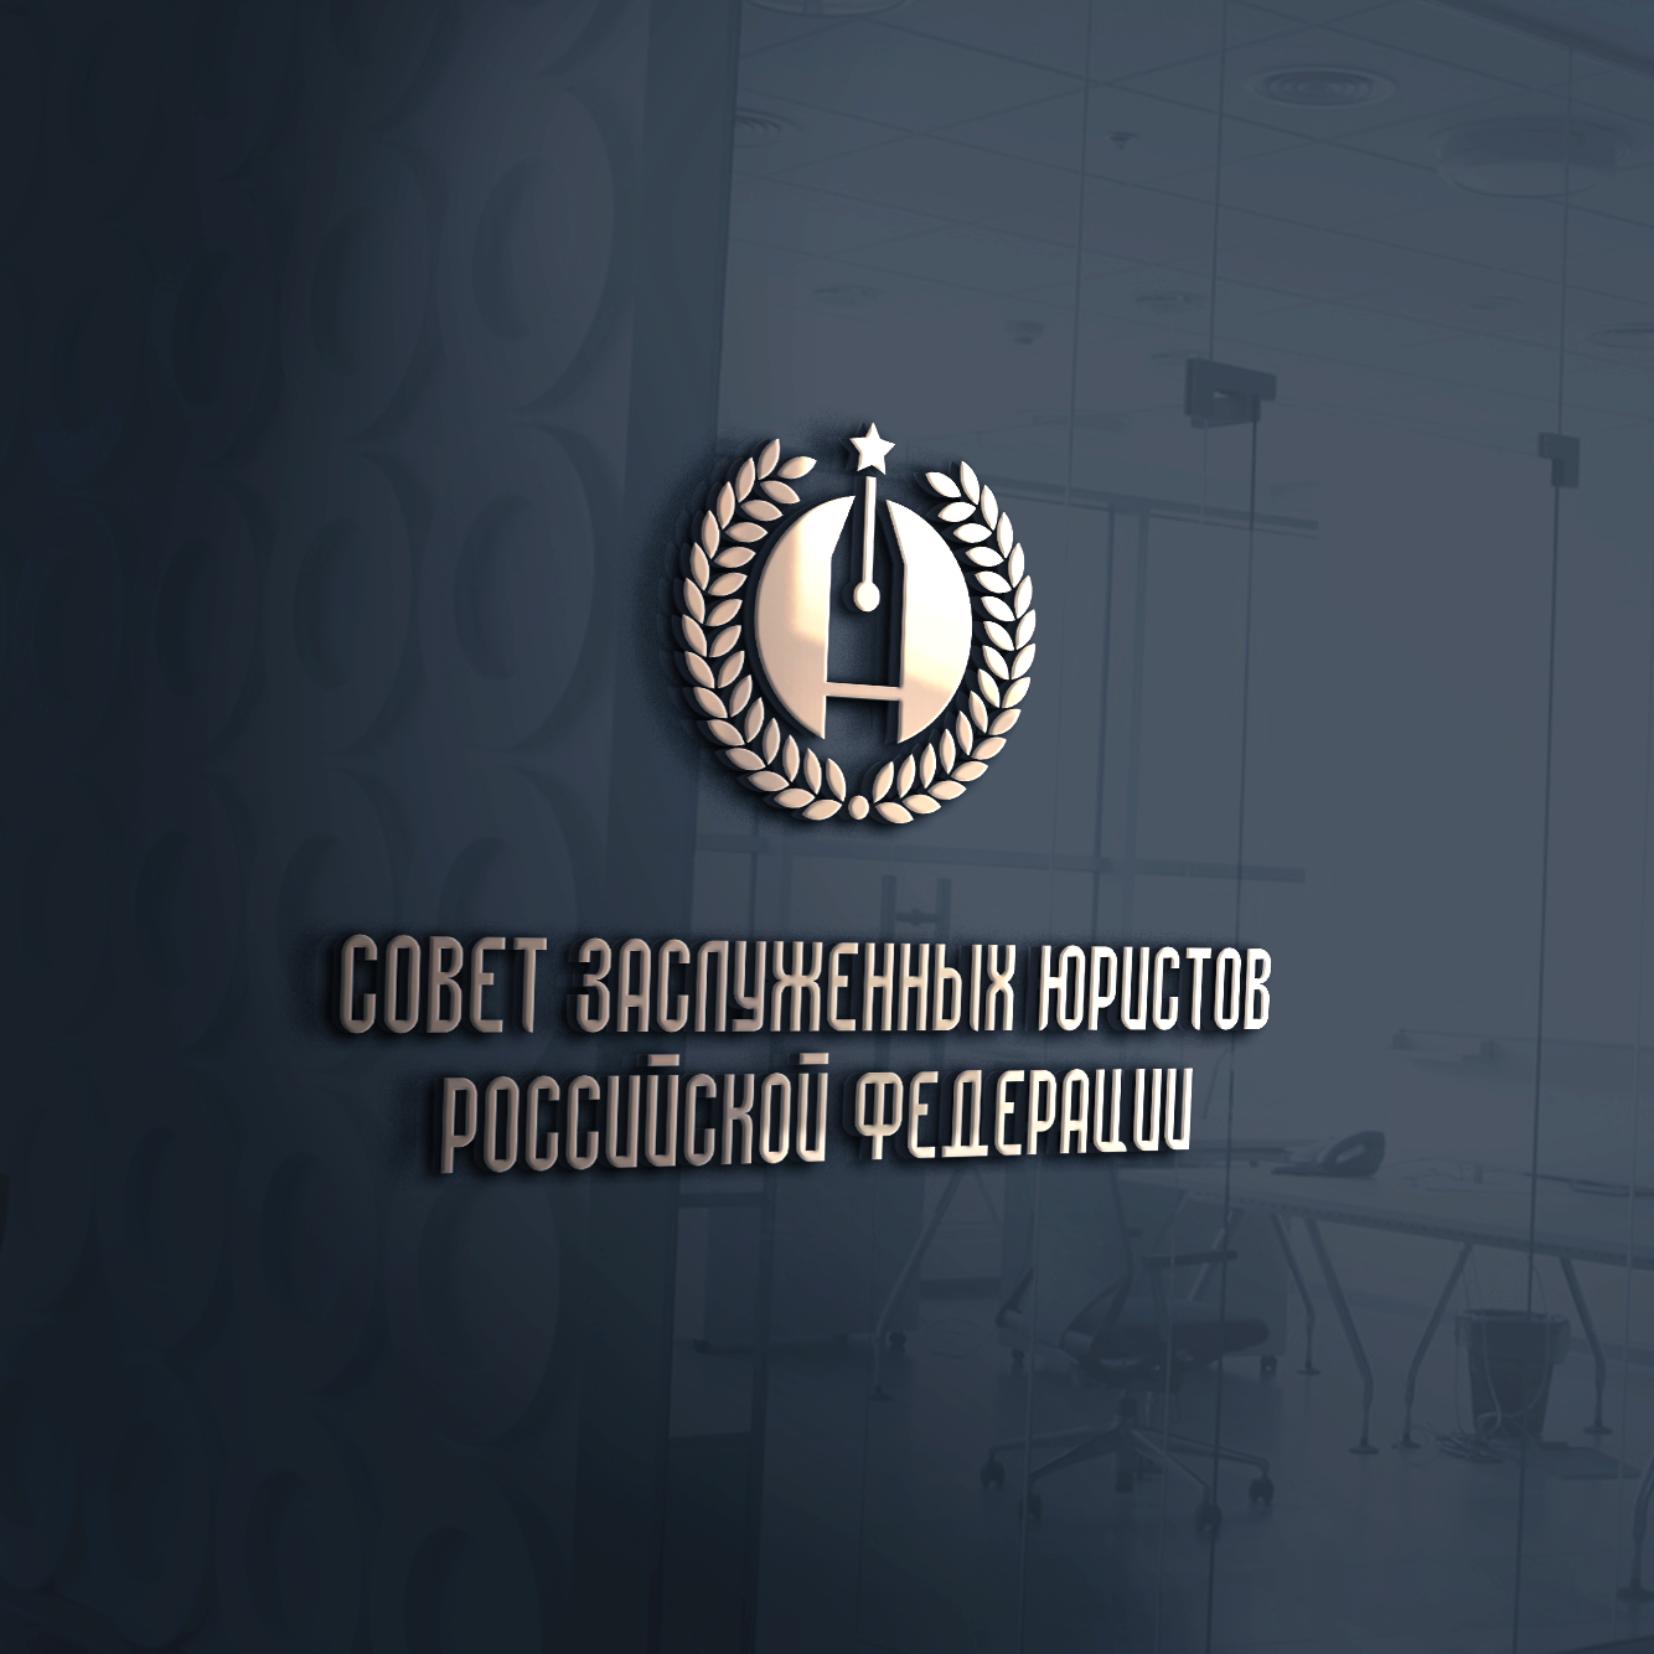 Разработка логотипа Совета (Клуба) заслуженных юристов Российской Федерации фото f_4335e47b8b63d79e.png